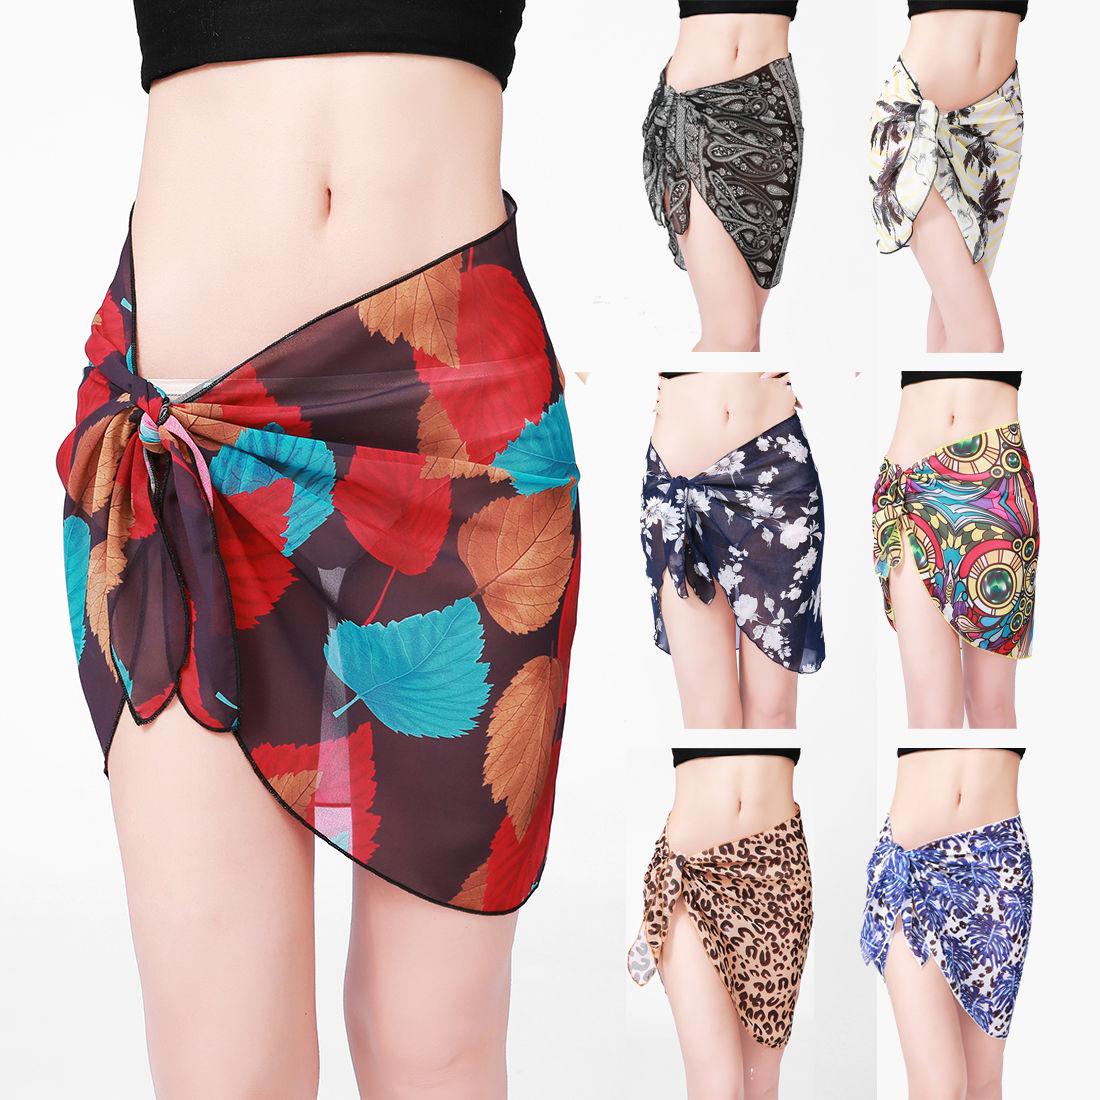 New Beach Skirt Women Chiffon Short Sarong Bikini Cover Wrap Up Summer Dress Swimwear Beachwear